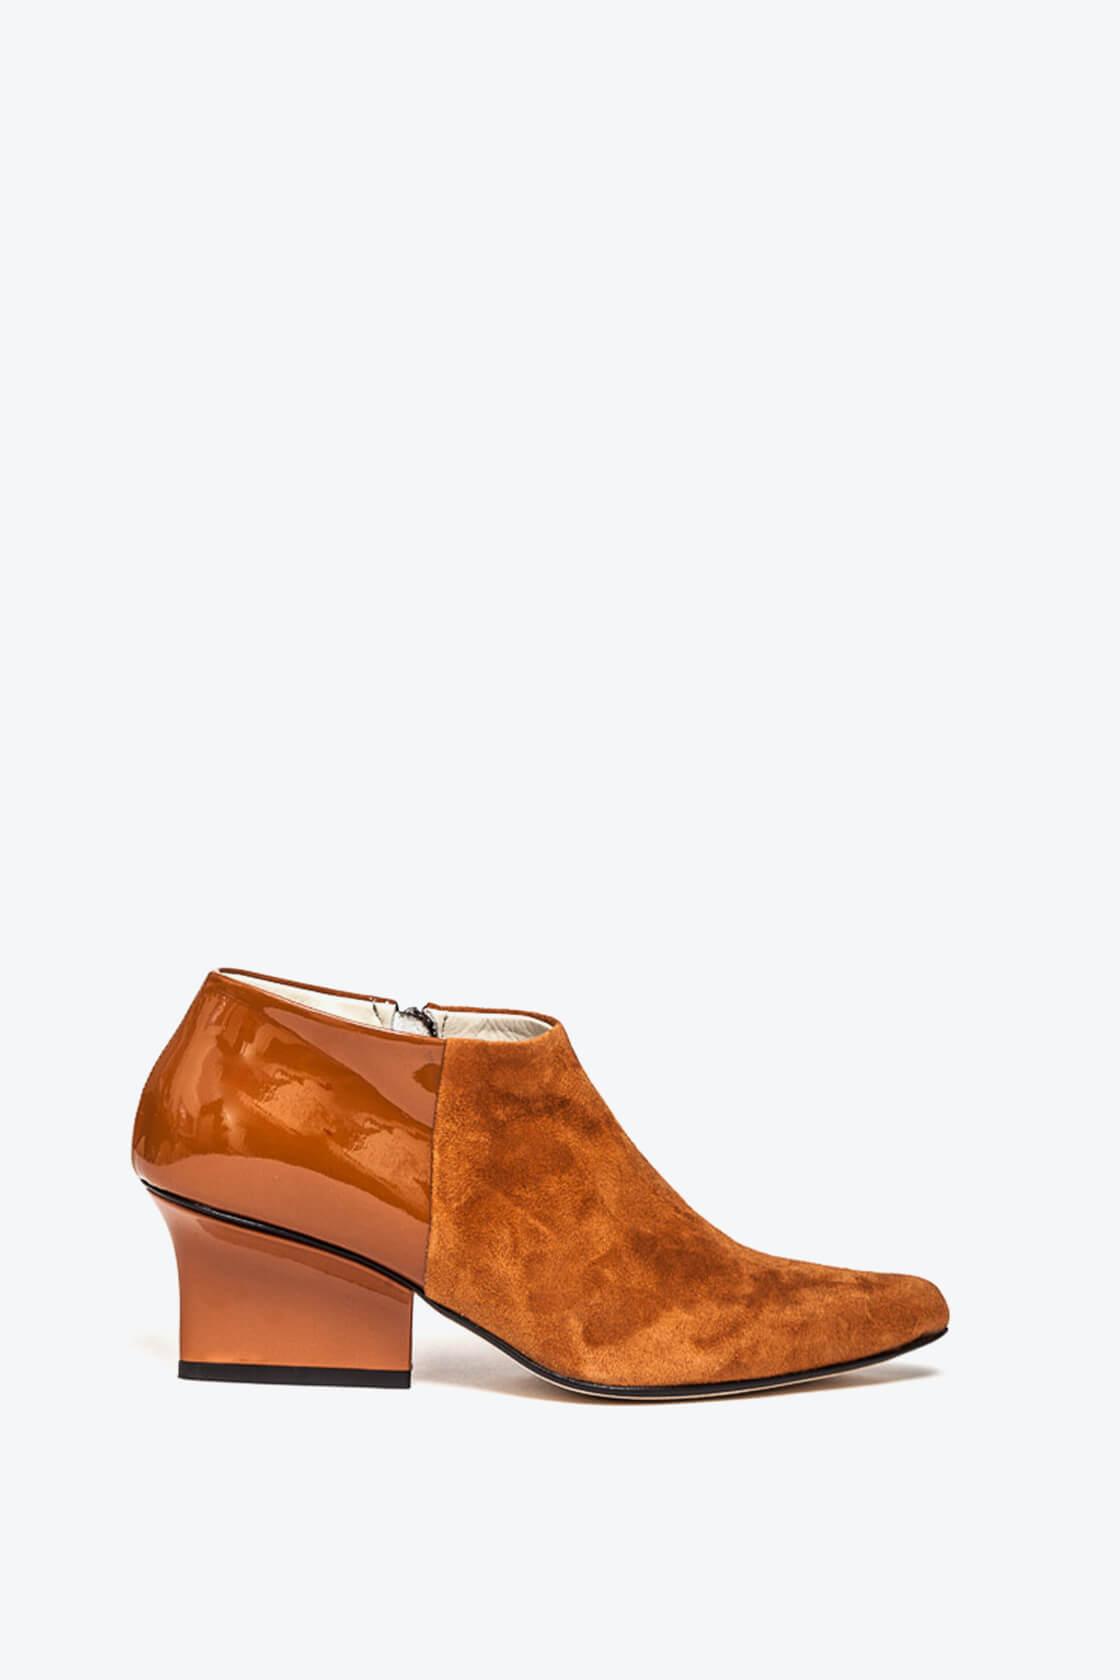 EJK0000026 Chris ankle boots caramel 1